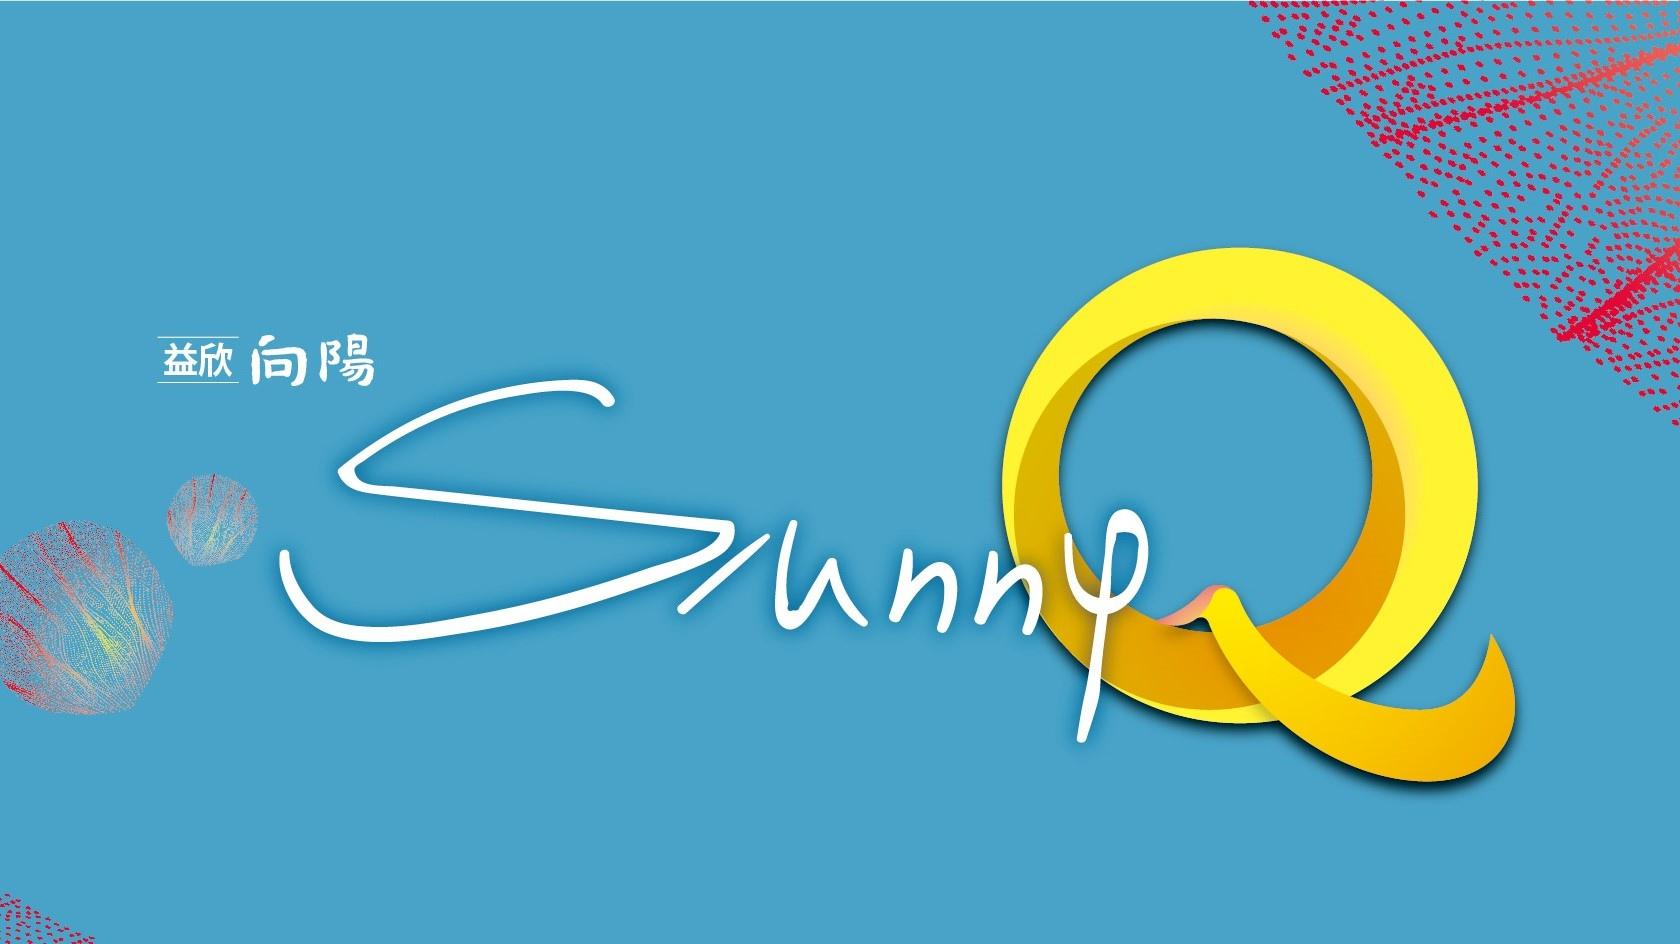 SunnyQ.jpg